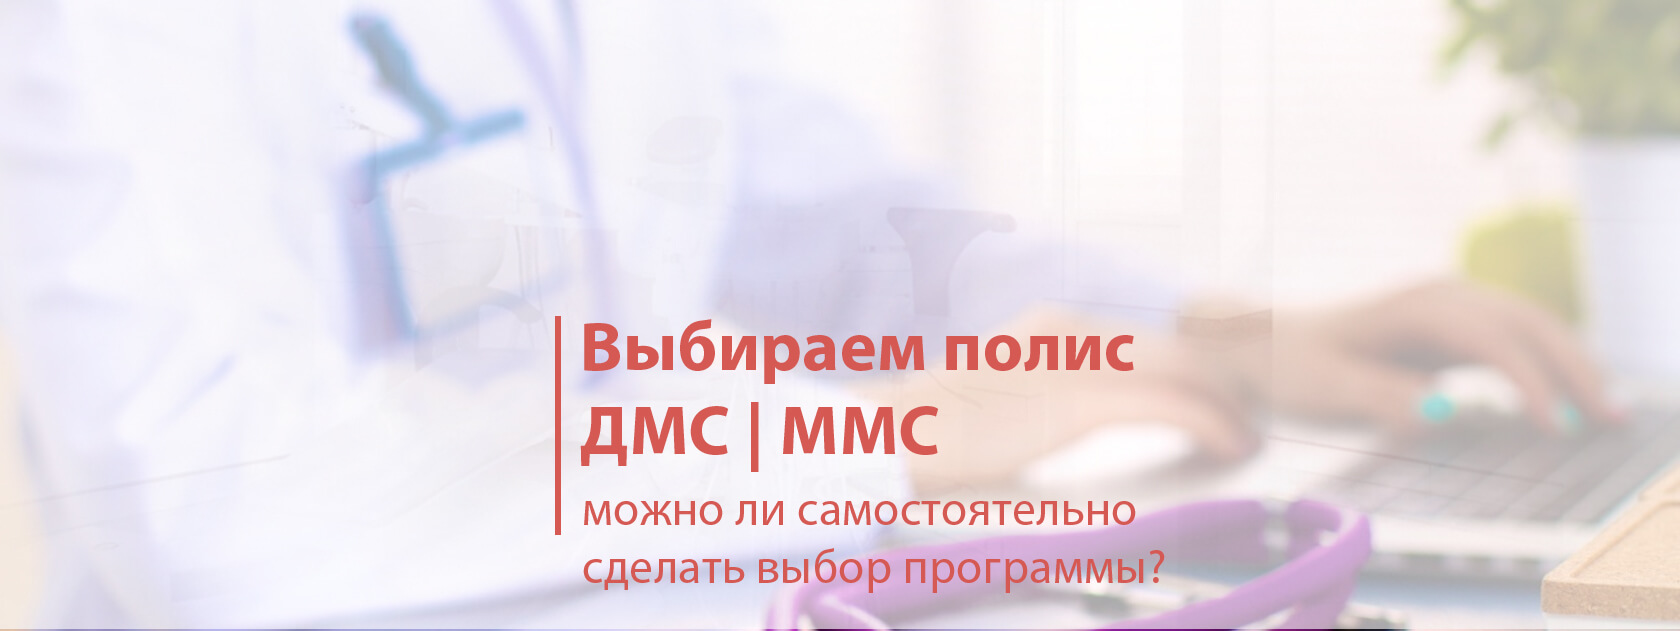 Выбираем медицинский полис ДМС и ММС